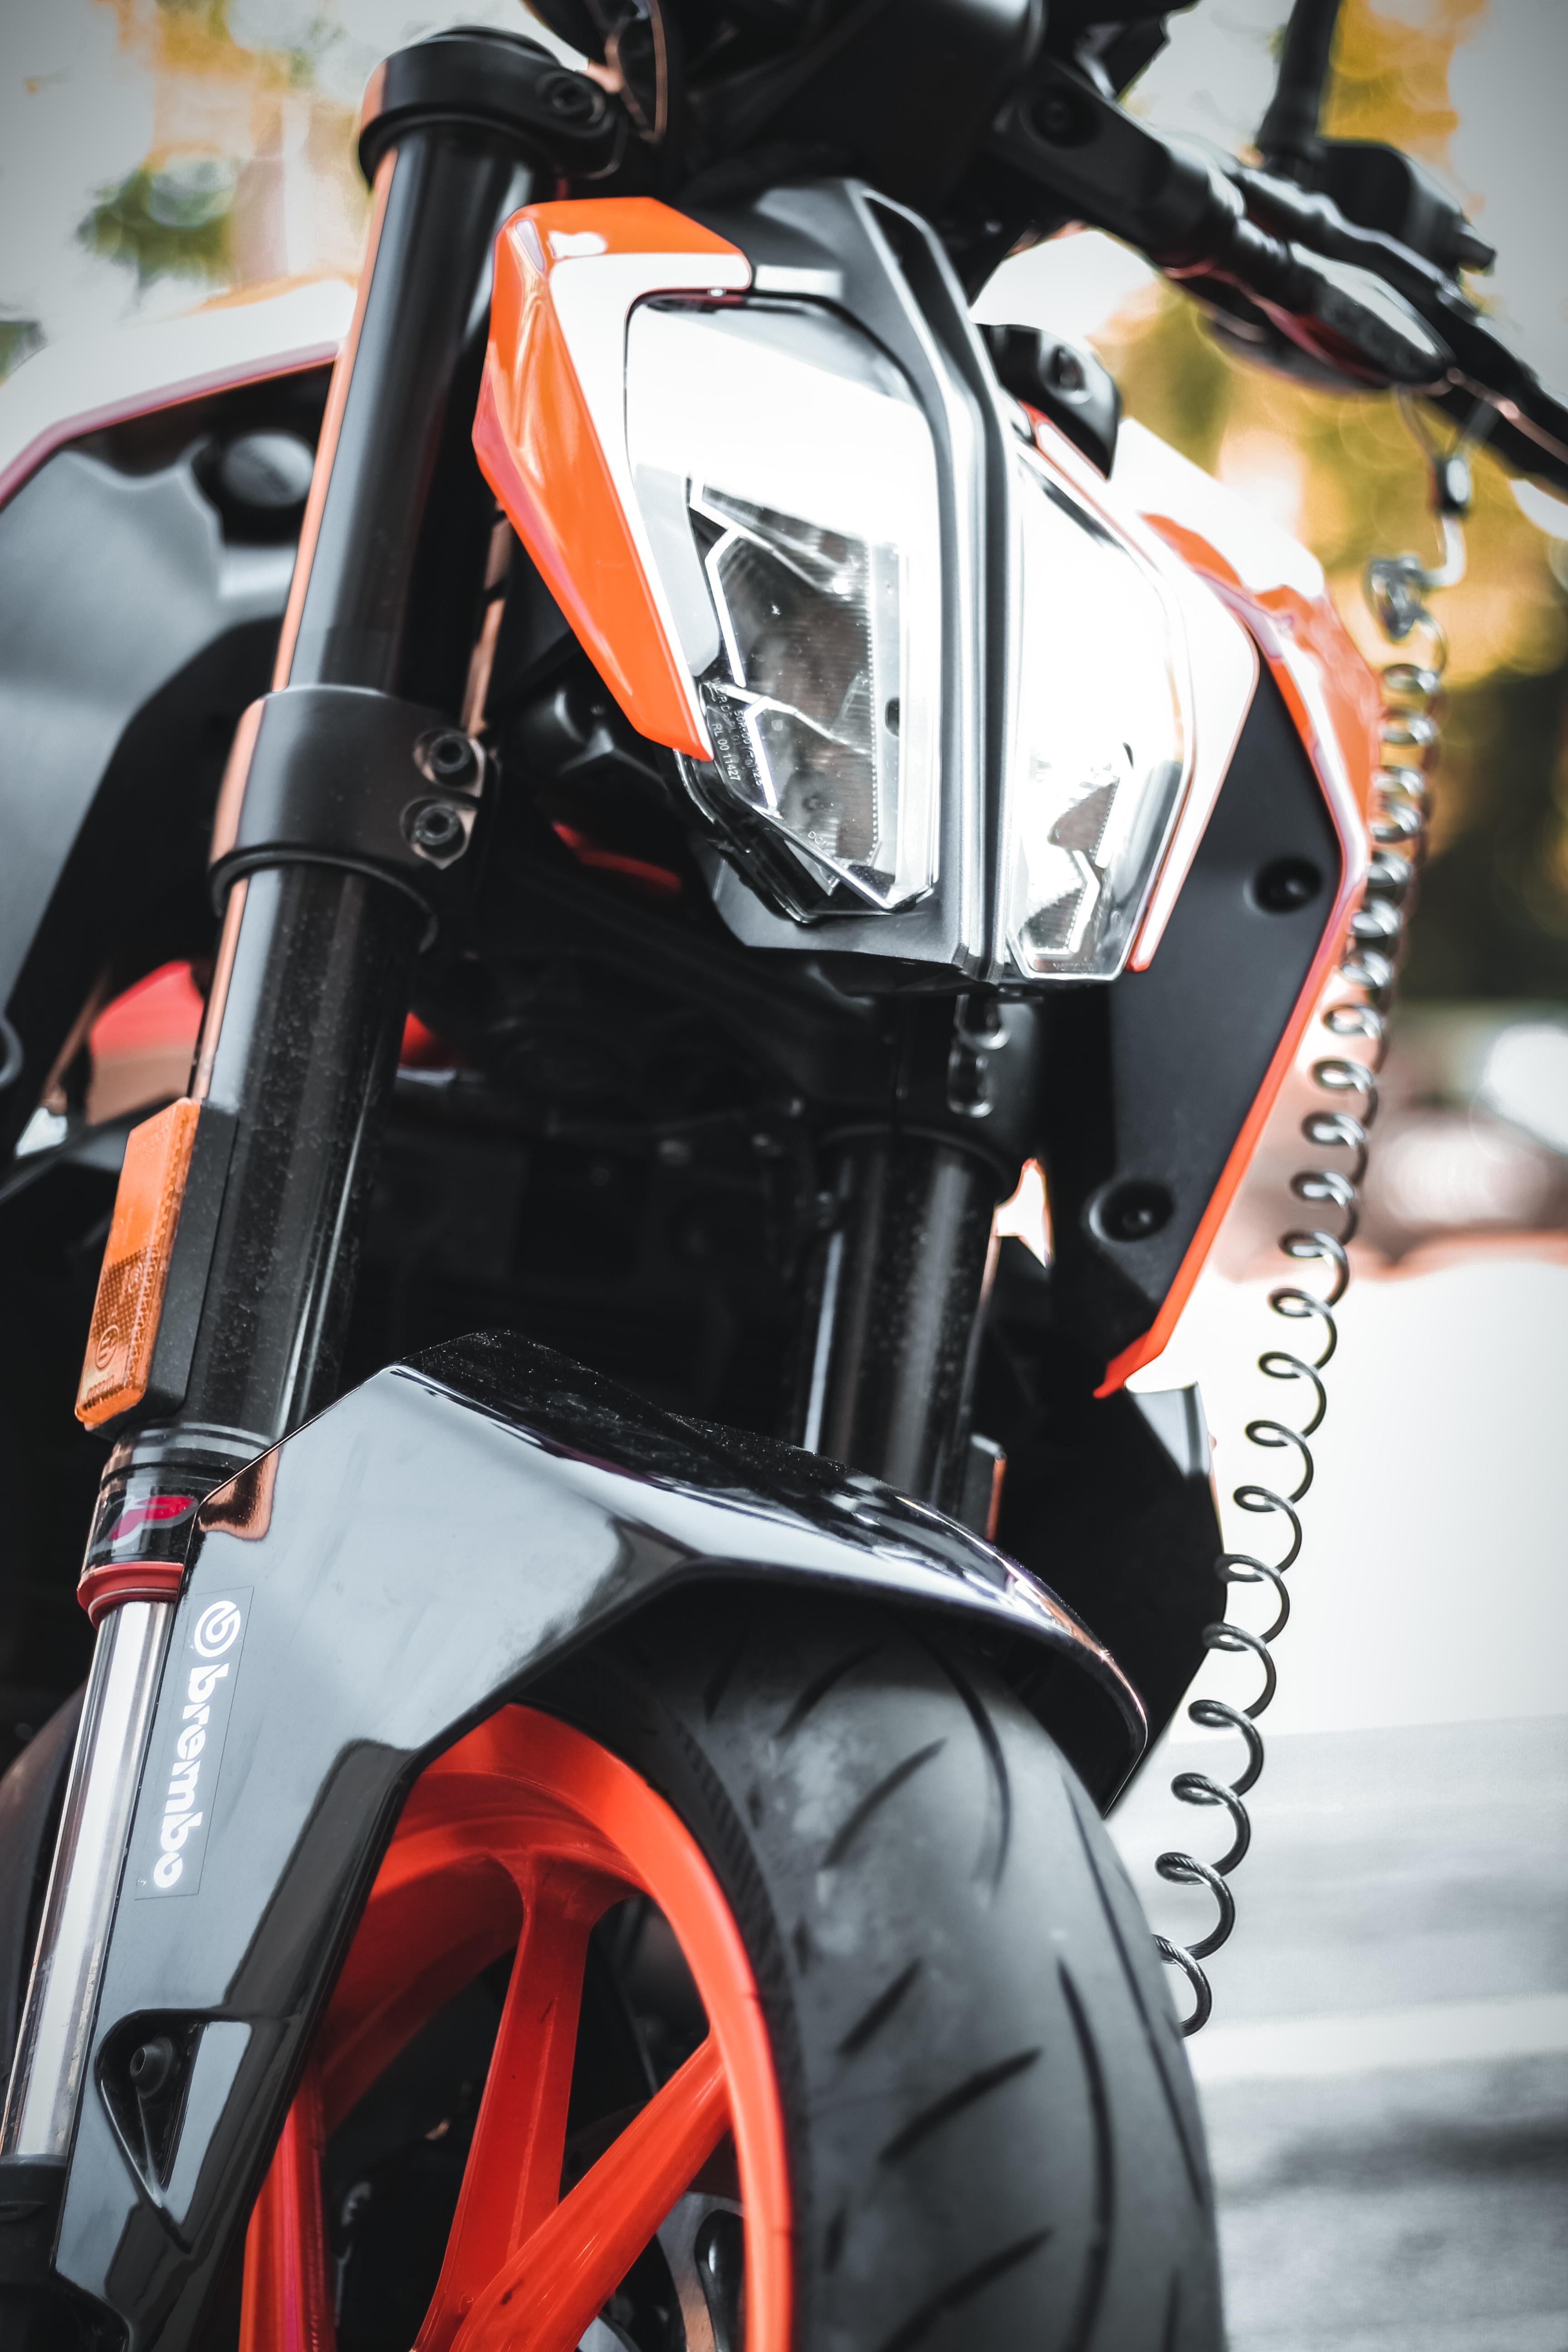 Shallow Focus Photo of Black and Orange Motorcycle